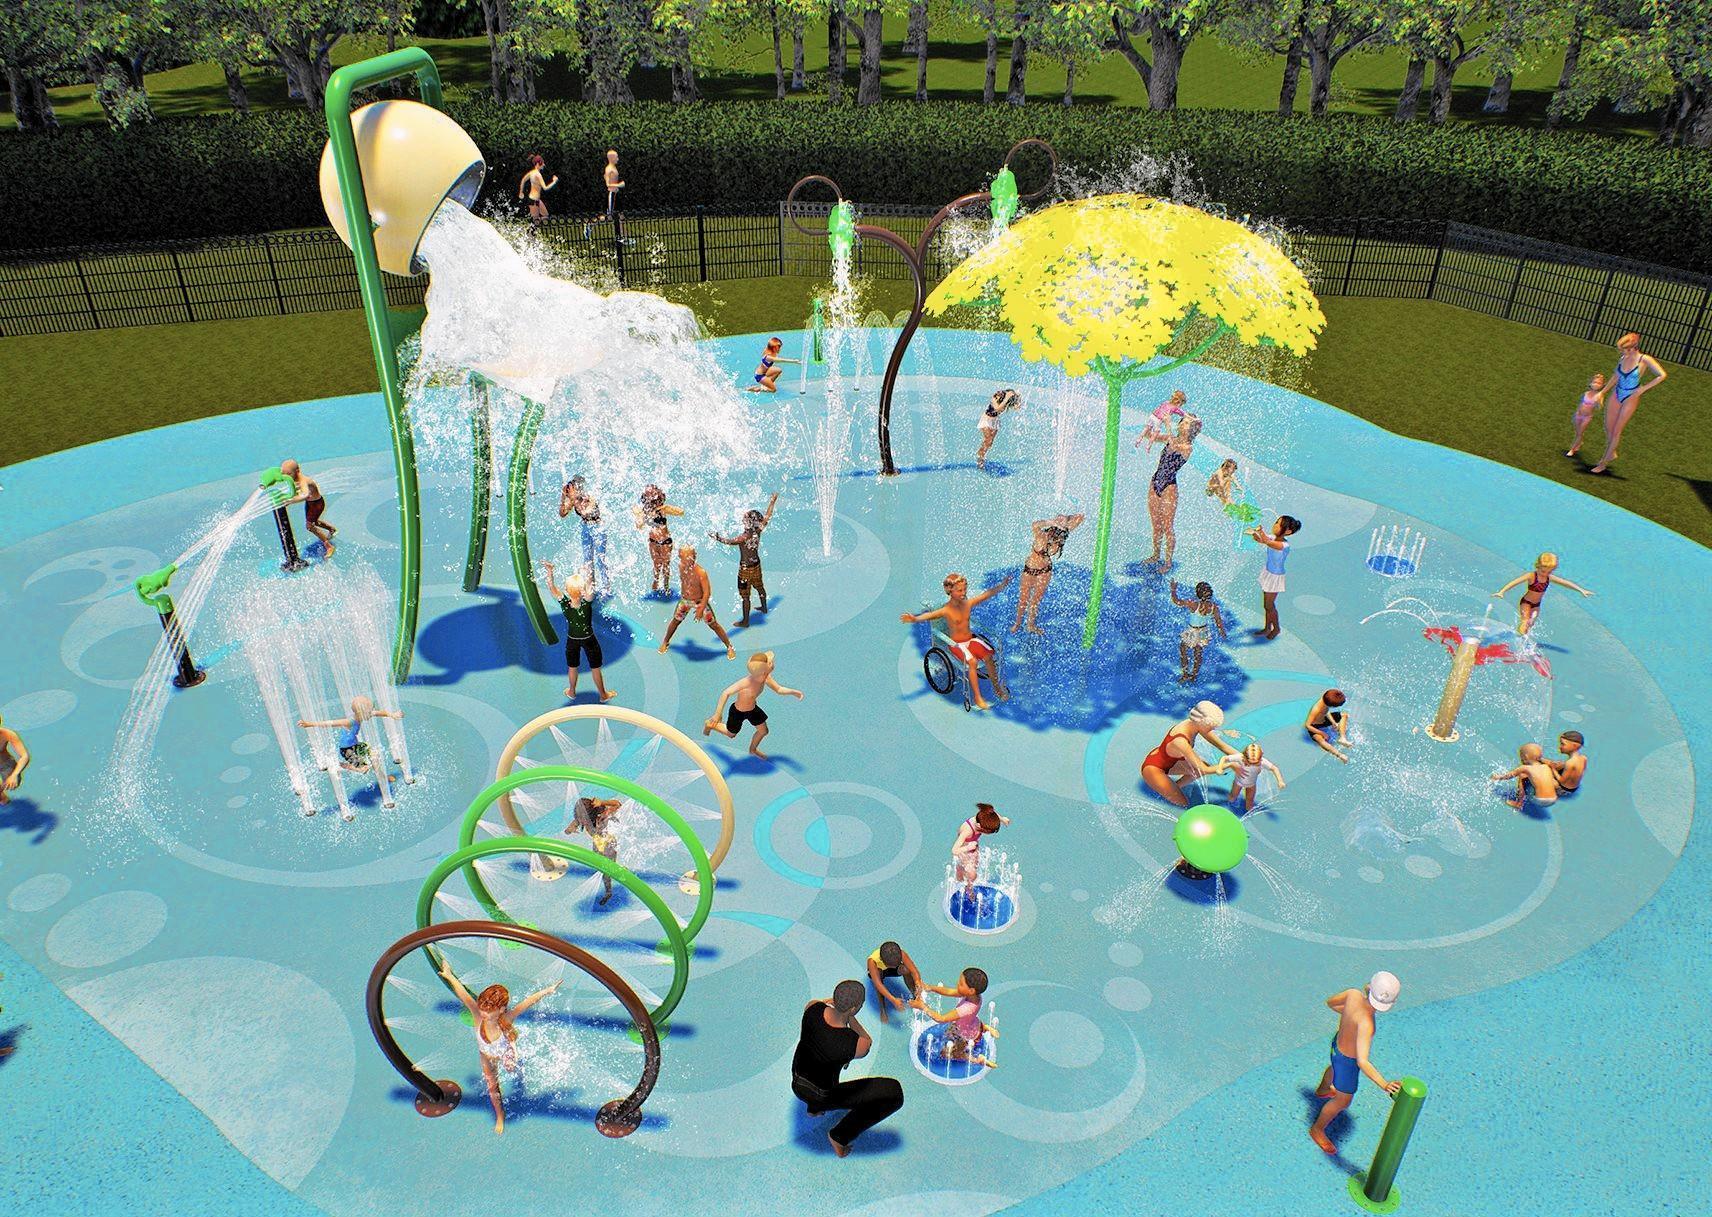 Leesburg Hopes To Make Splash With Water Park Orlando Sentinel